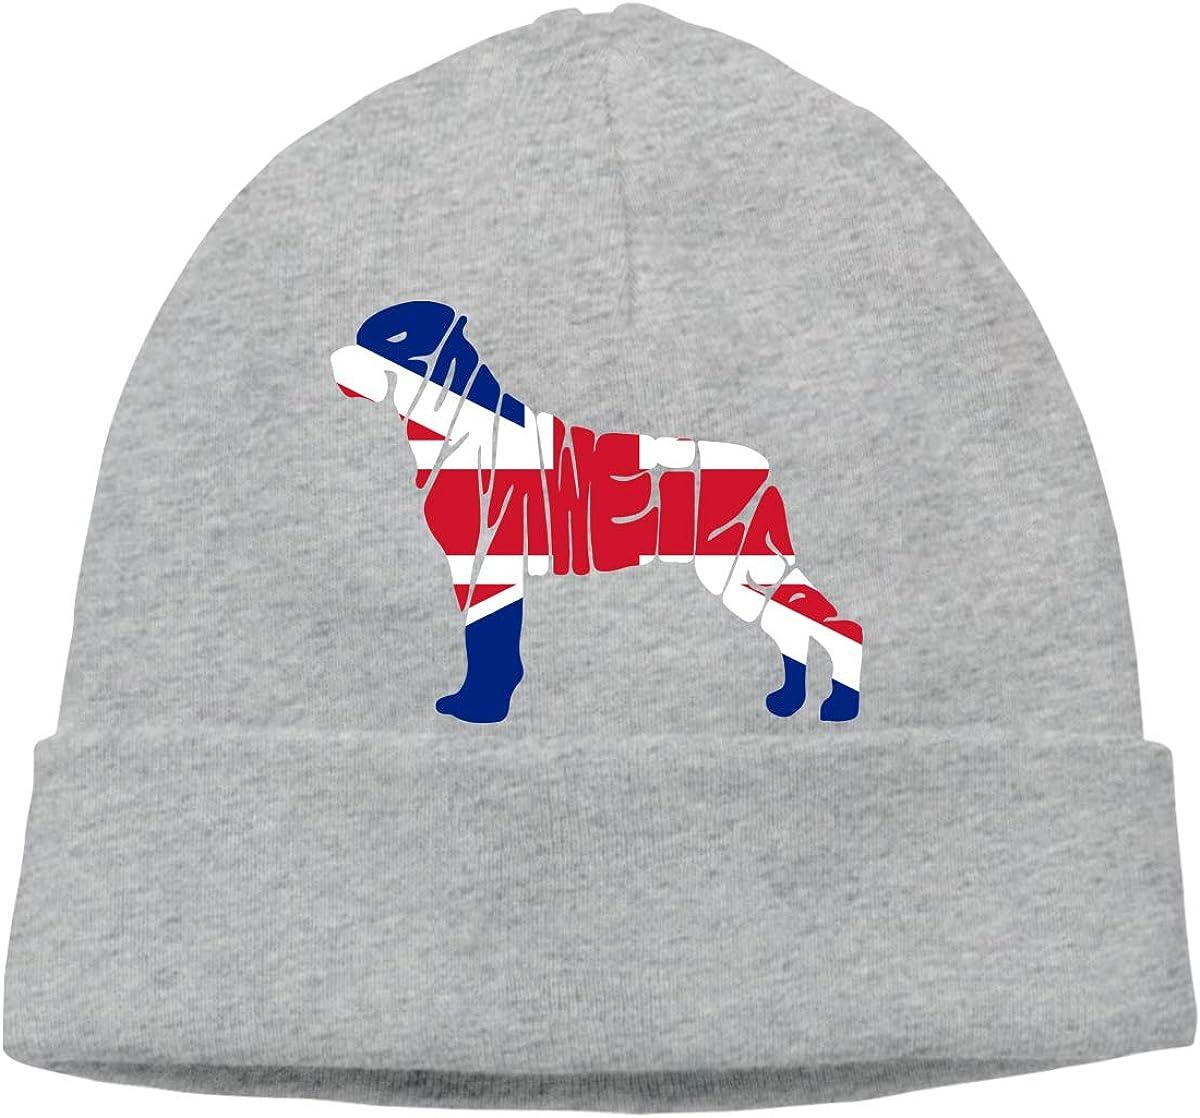 BF5Y3z/&MA British Flag Rottweiler Dog Beanie Hat for Men Women,Warm Cozy Knitting Hat Skull Cap